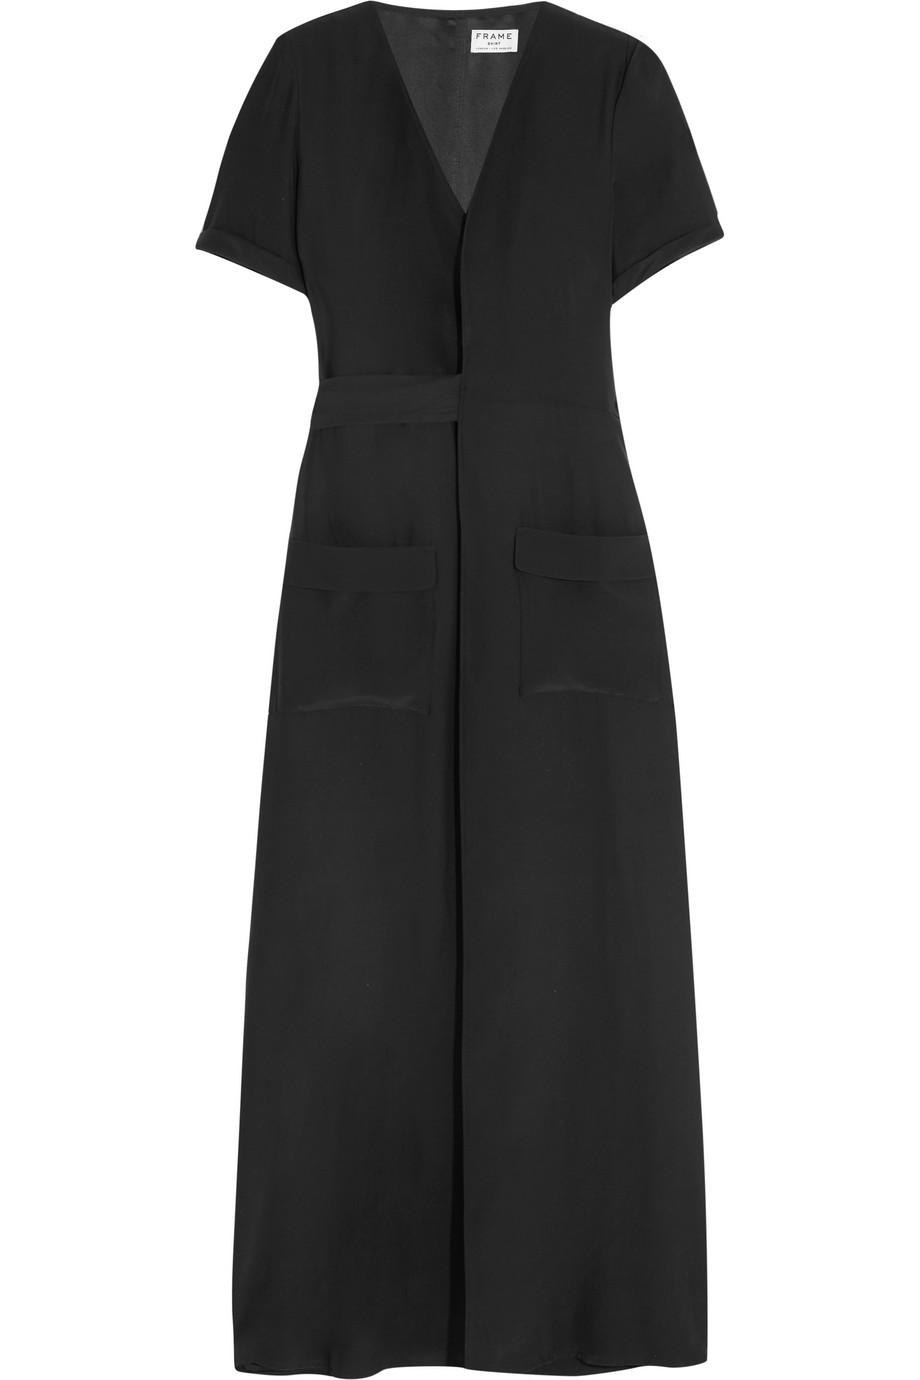 Le Wrap Silk-Charmeuse Maxi Dress, Black, Women's, Size: XS